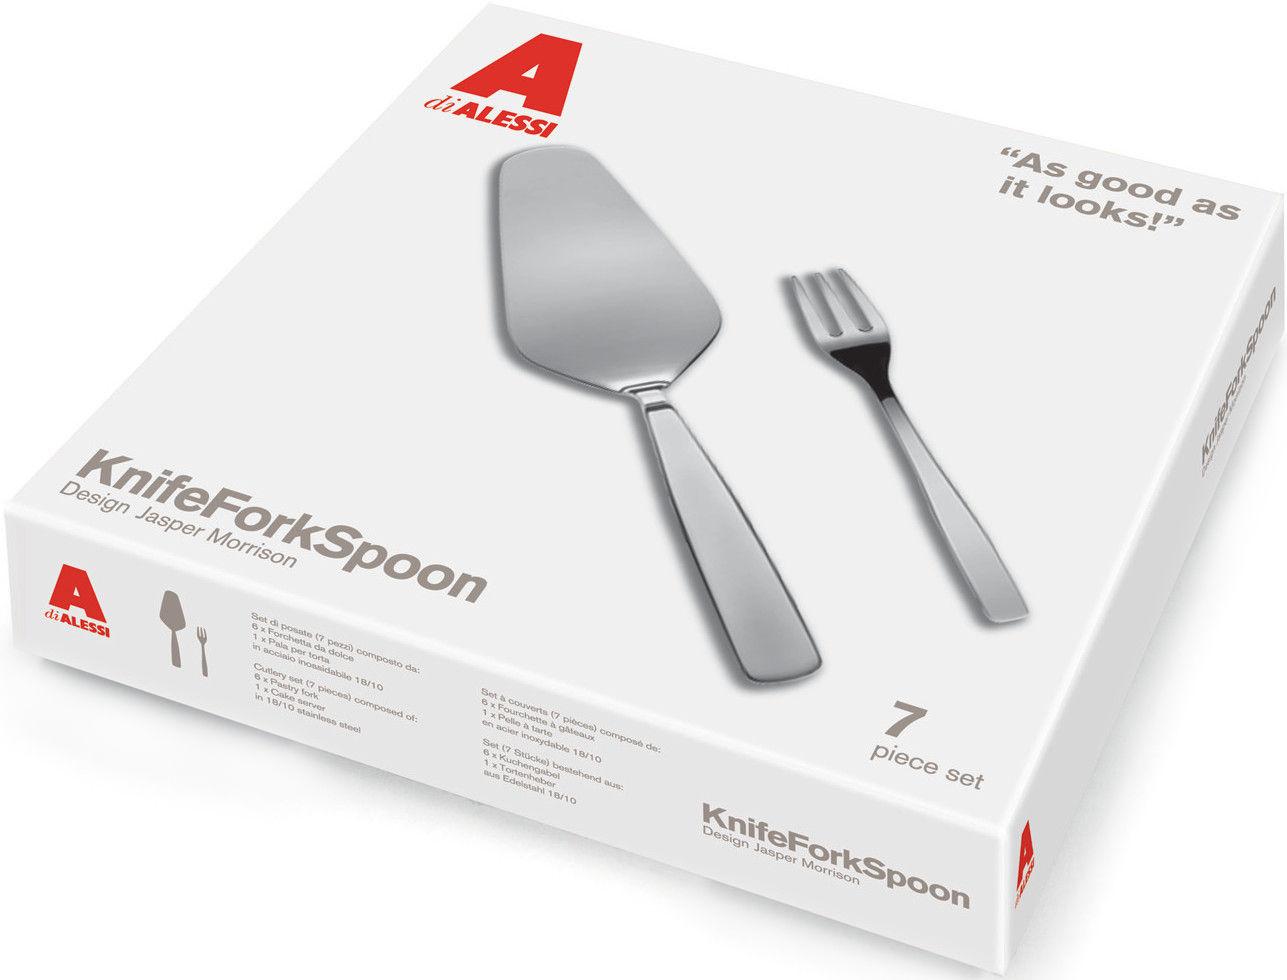 Tableware - Cutlery - KnifeForkSpoon Cutlery set by A di Alessi - Steel - Stainless steel